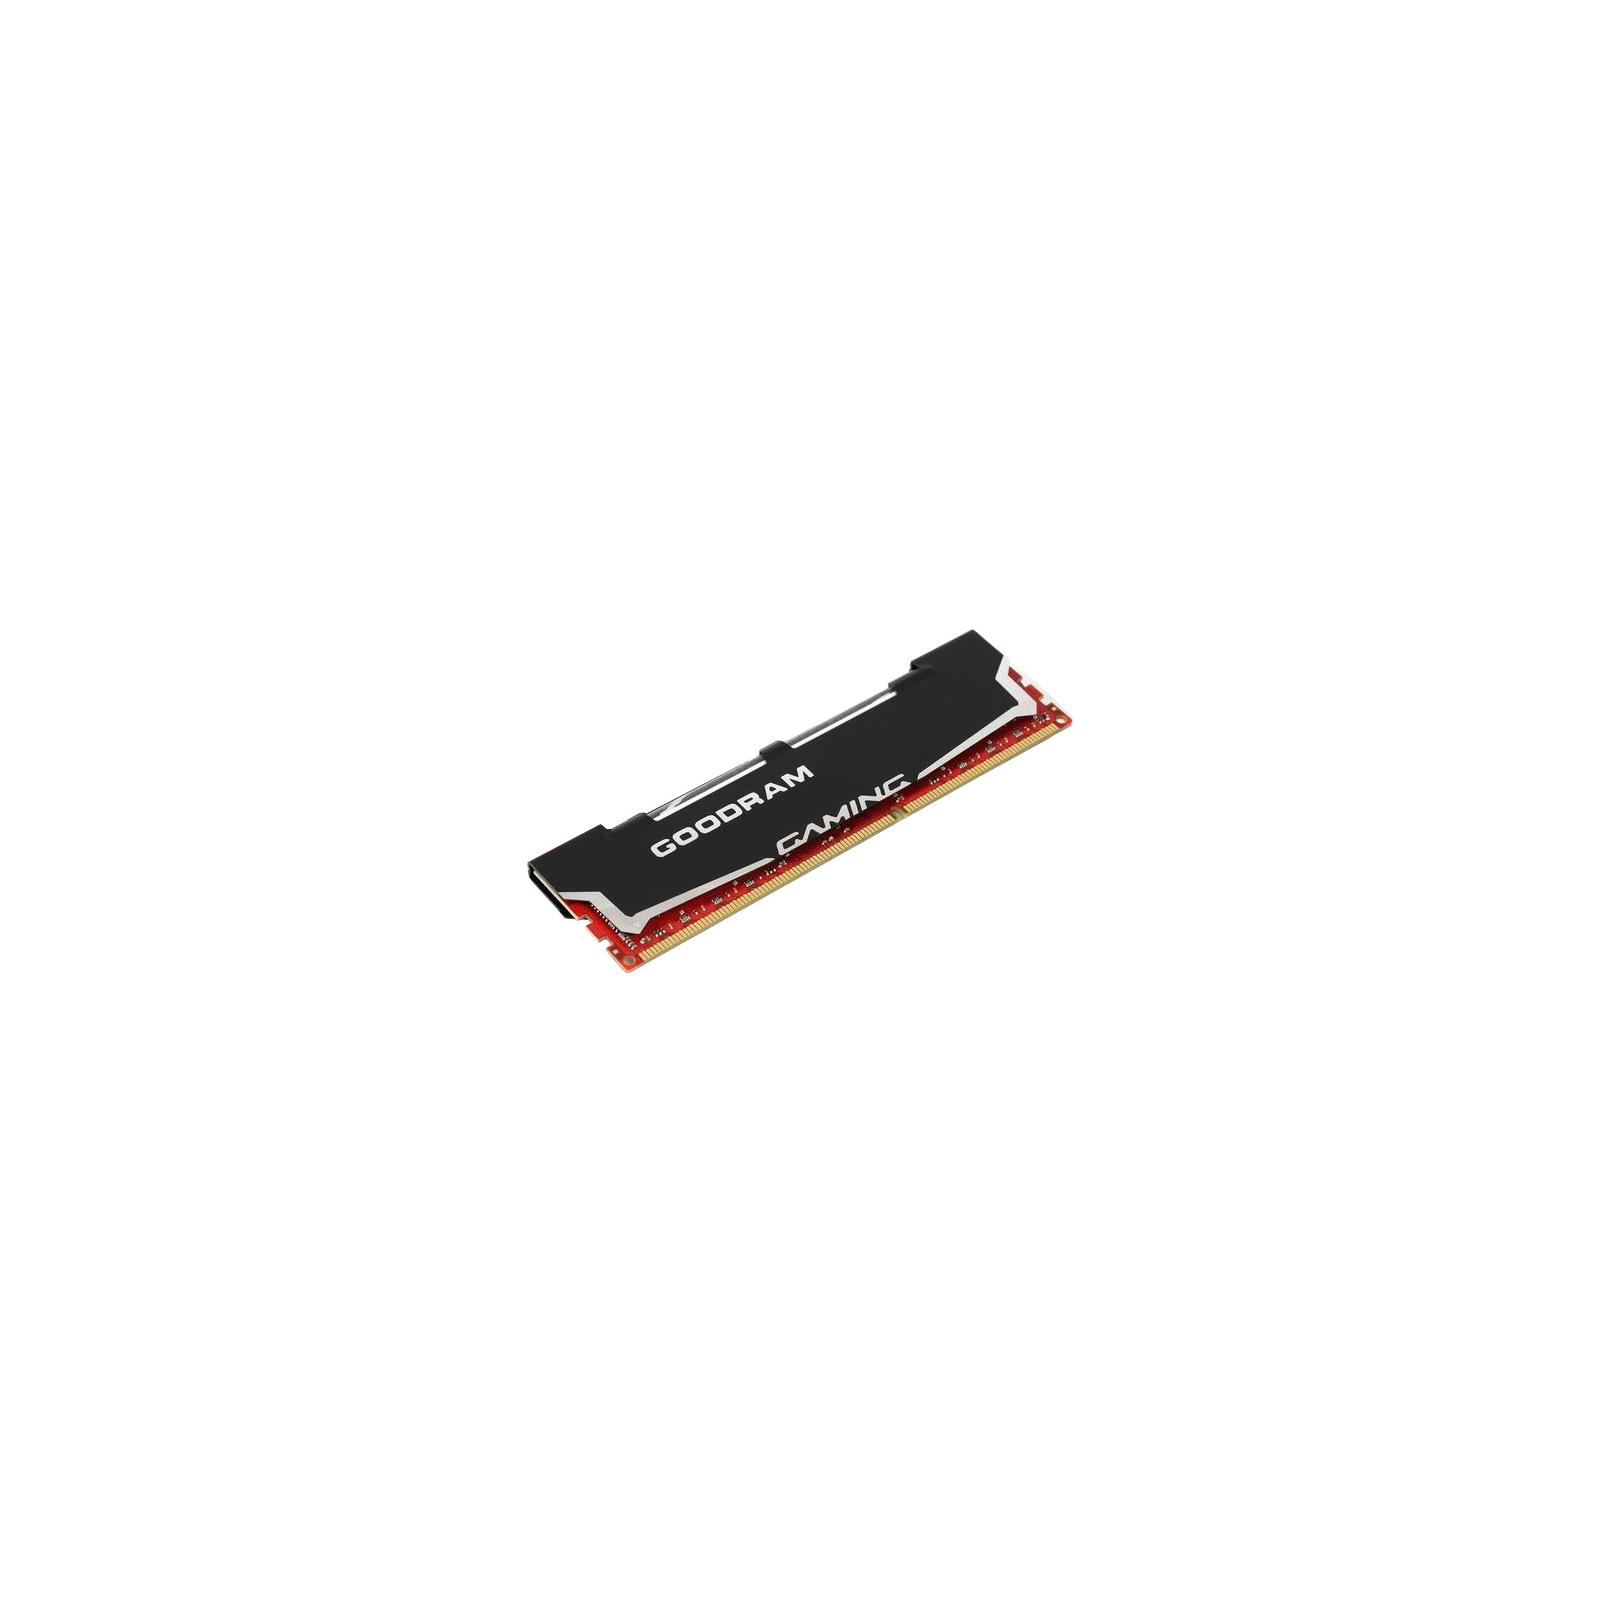 Модуль памяти для компьютера DDR3 4Gb 1600 MHz Led Gaming GOODRAM (GL1600D364L9/4G) изображение 2